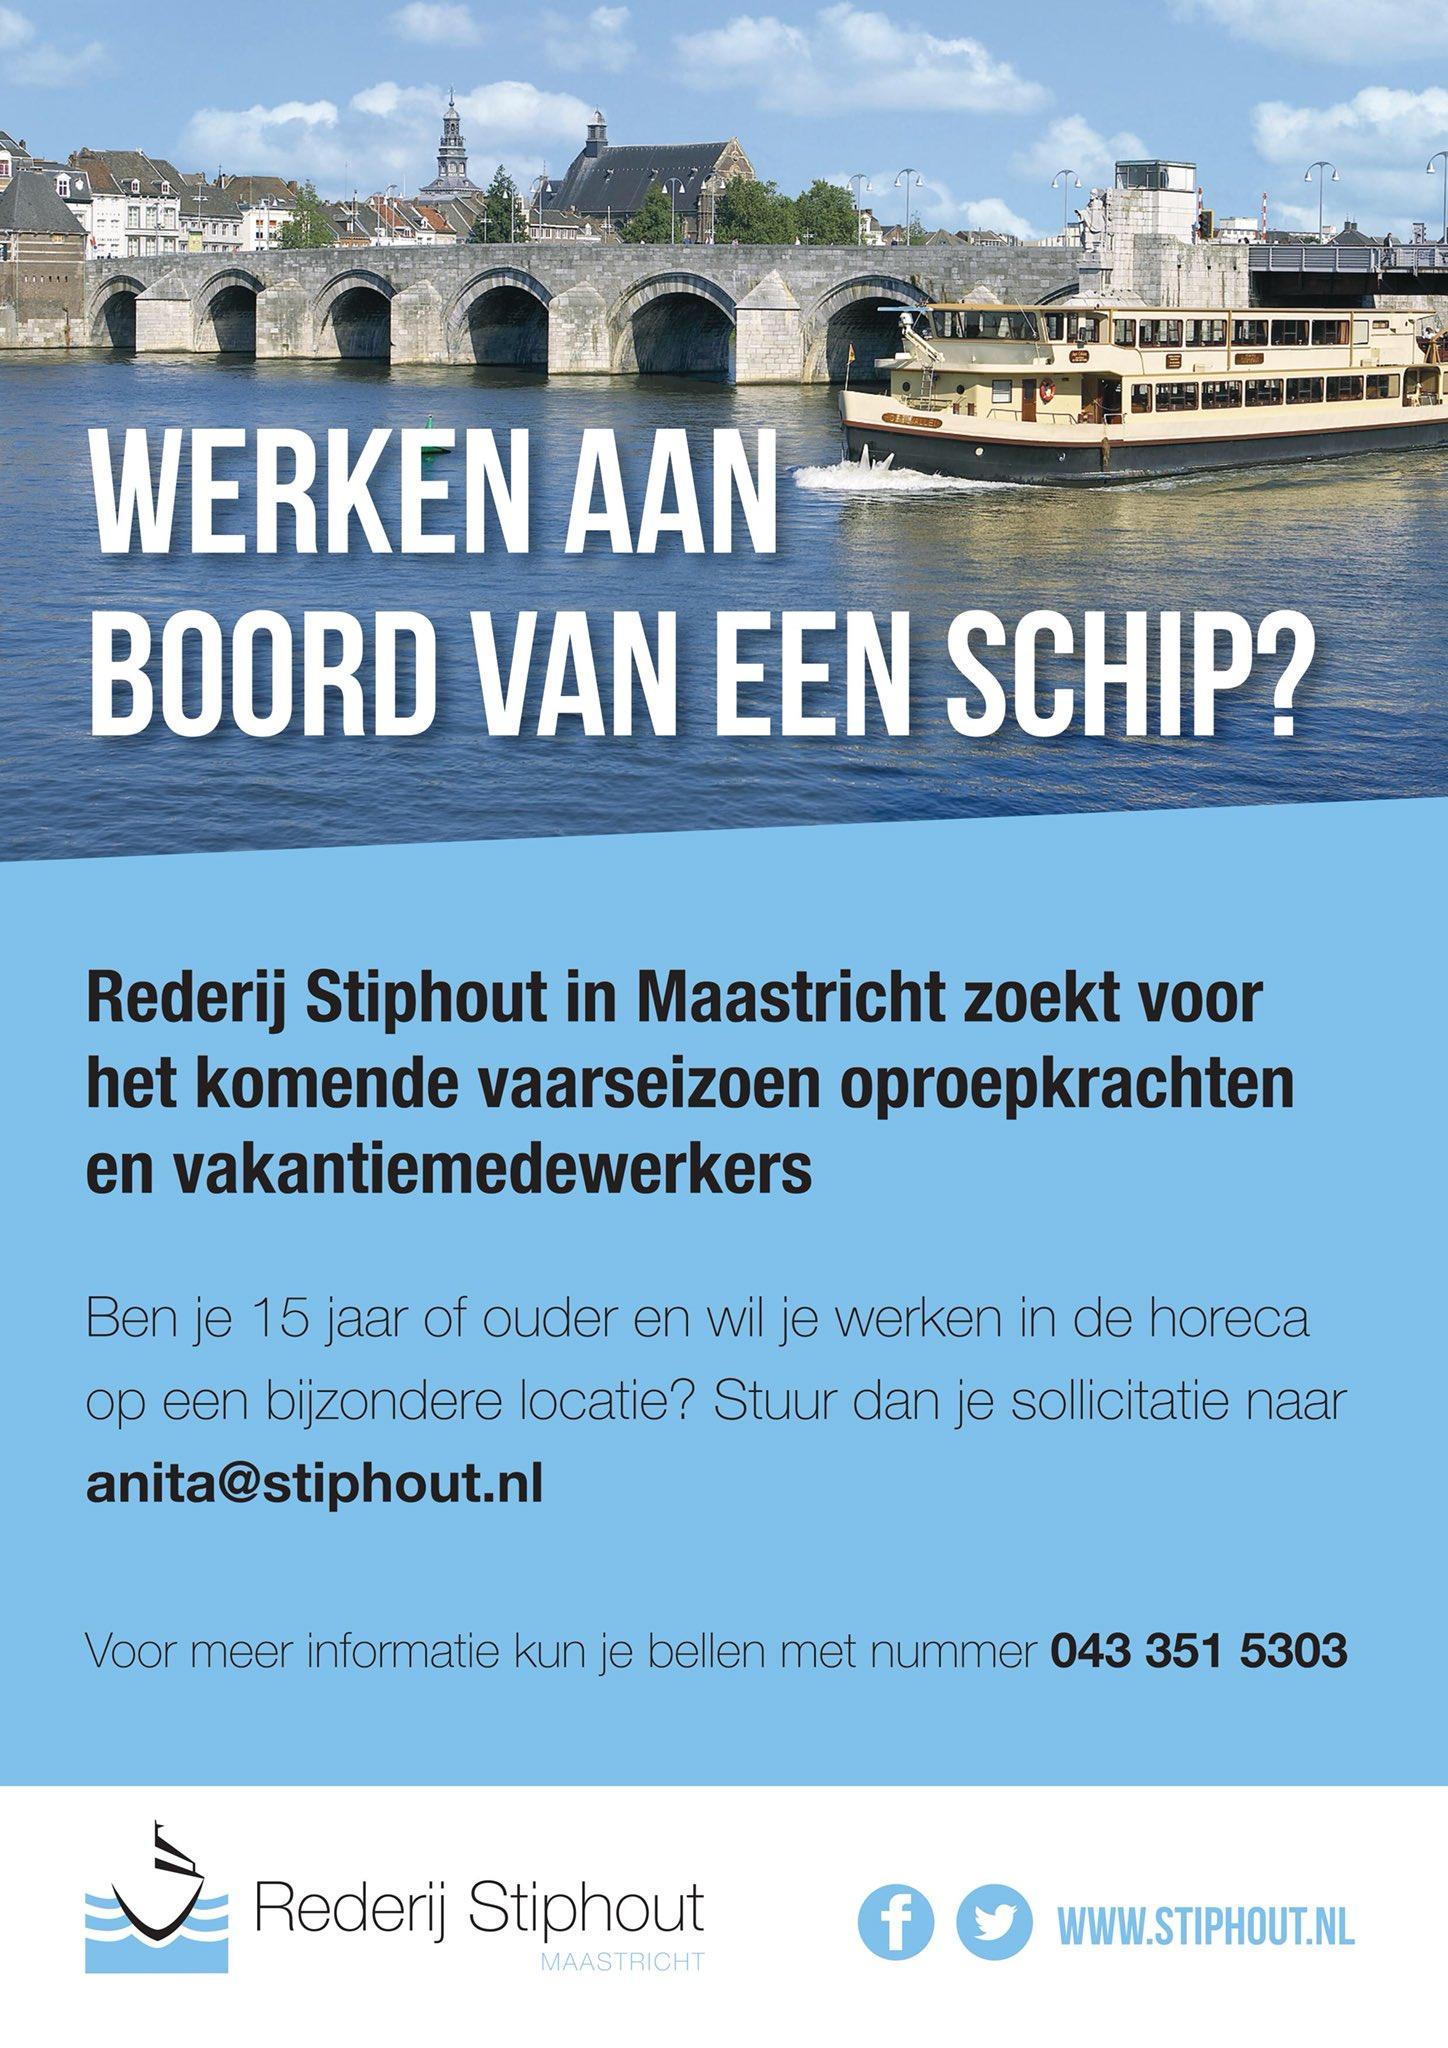 Rederij Stiphout On Twitter